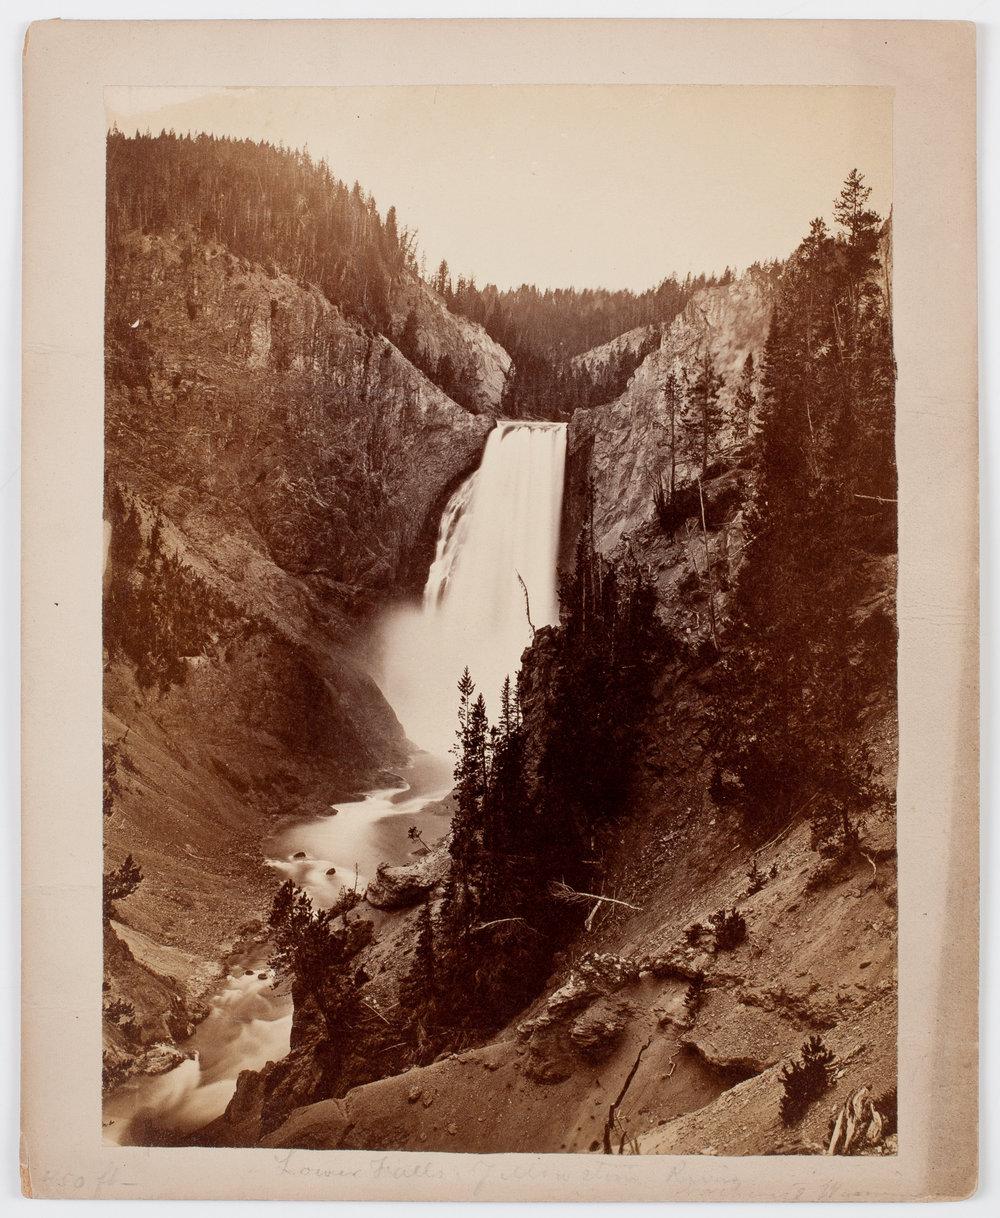 Joshua Crissman. Lower Falls, Yellowstone River. Albumen print. Bozeman, Montana, 1871.